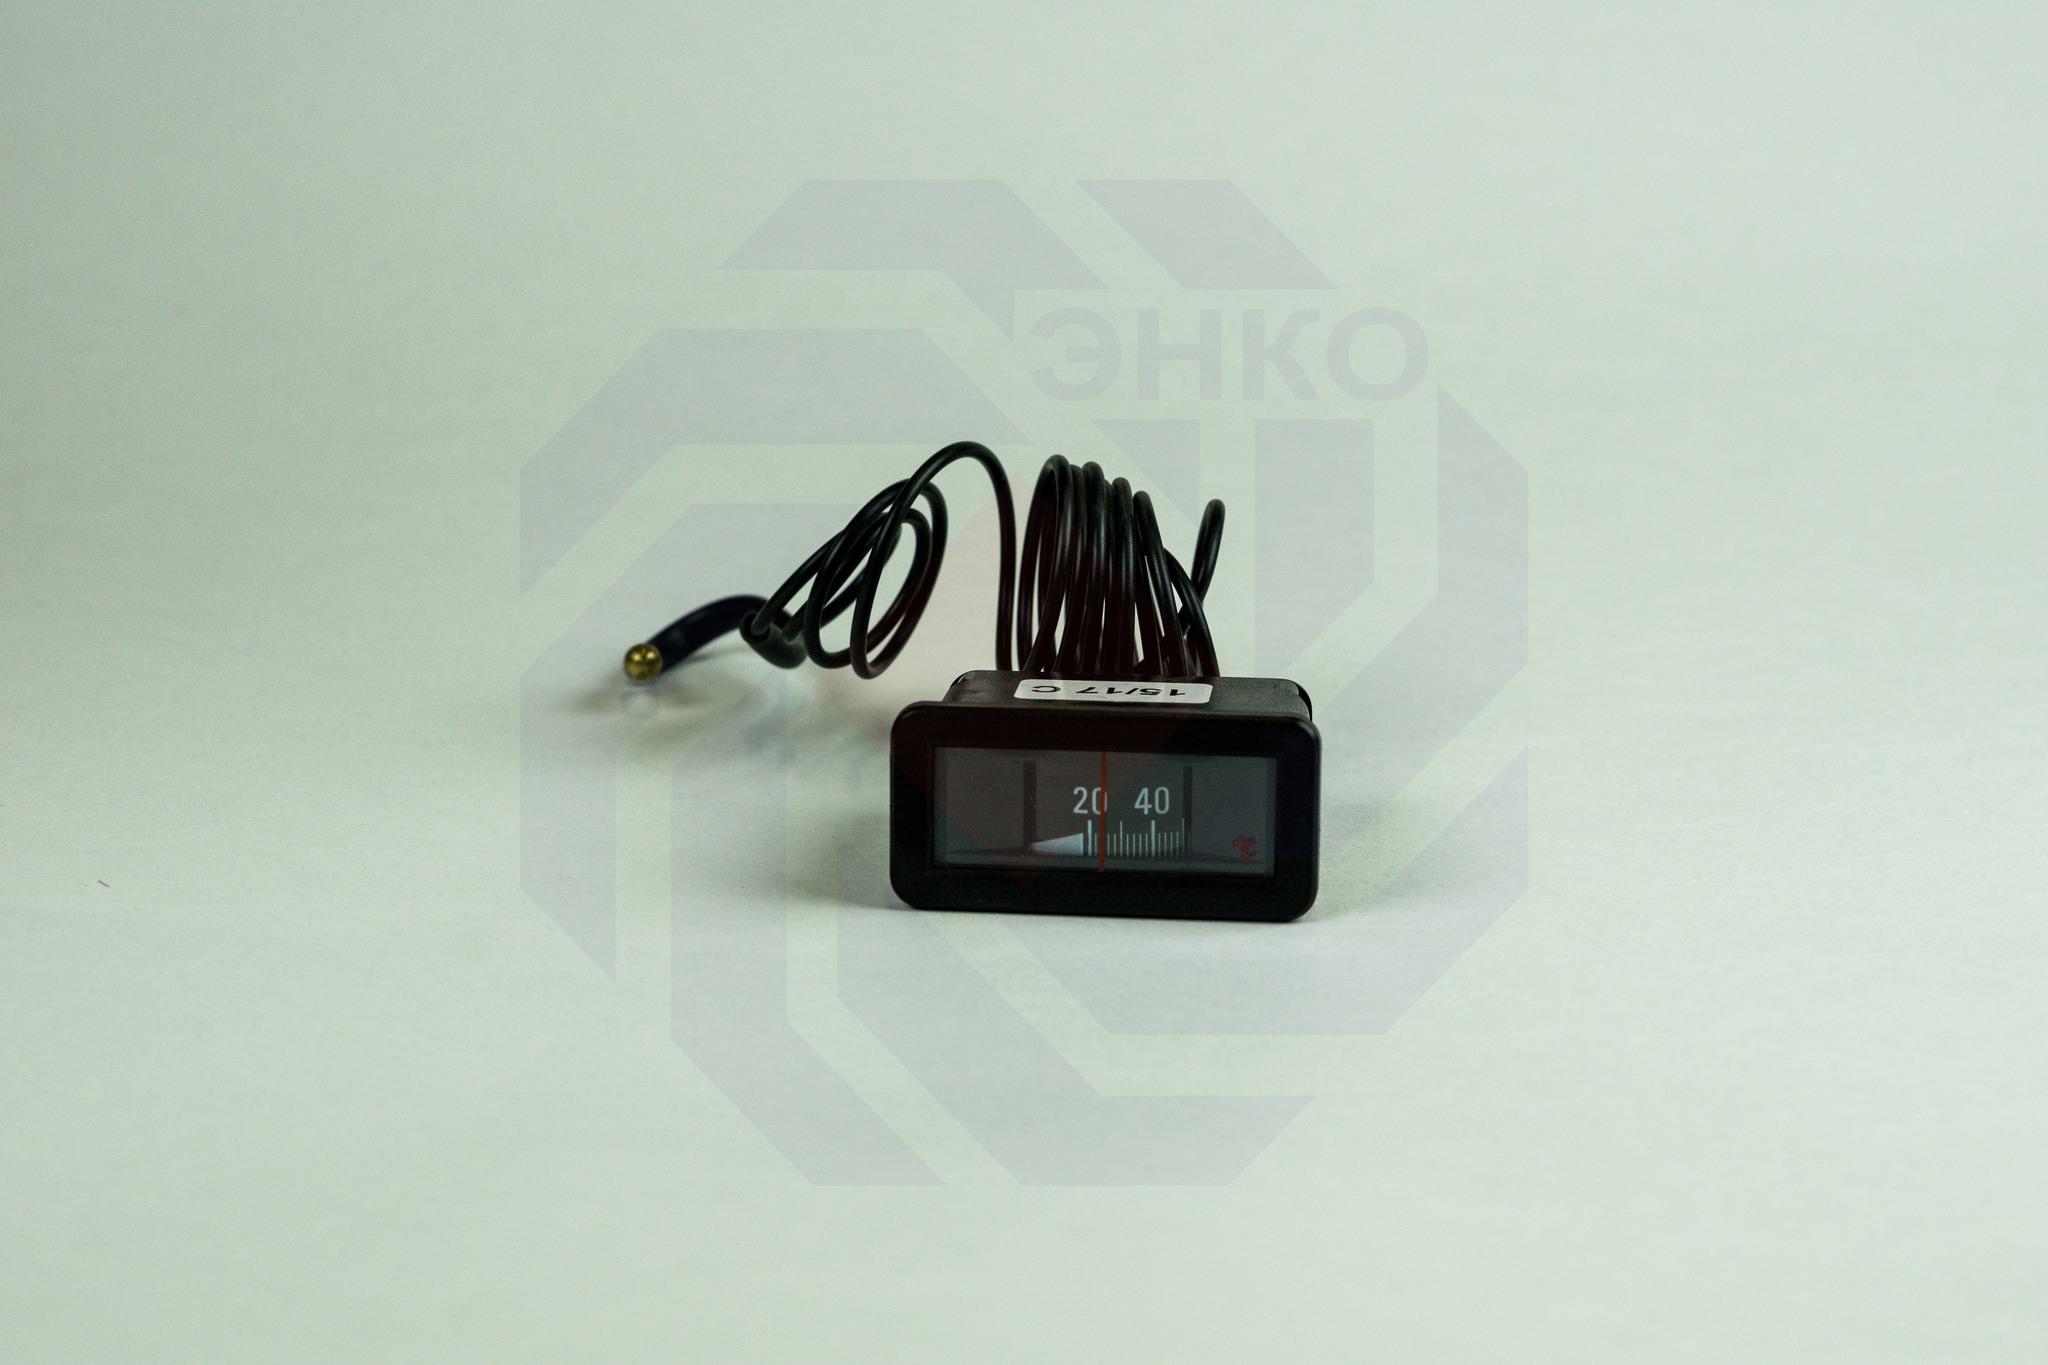 Термометр дистанционный WATTS TEF 64/31 0-120 °С